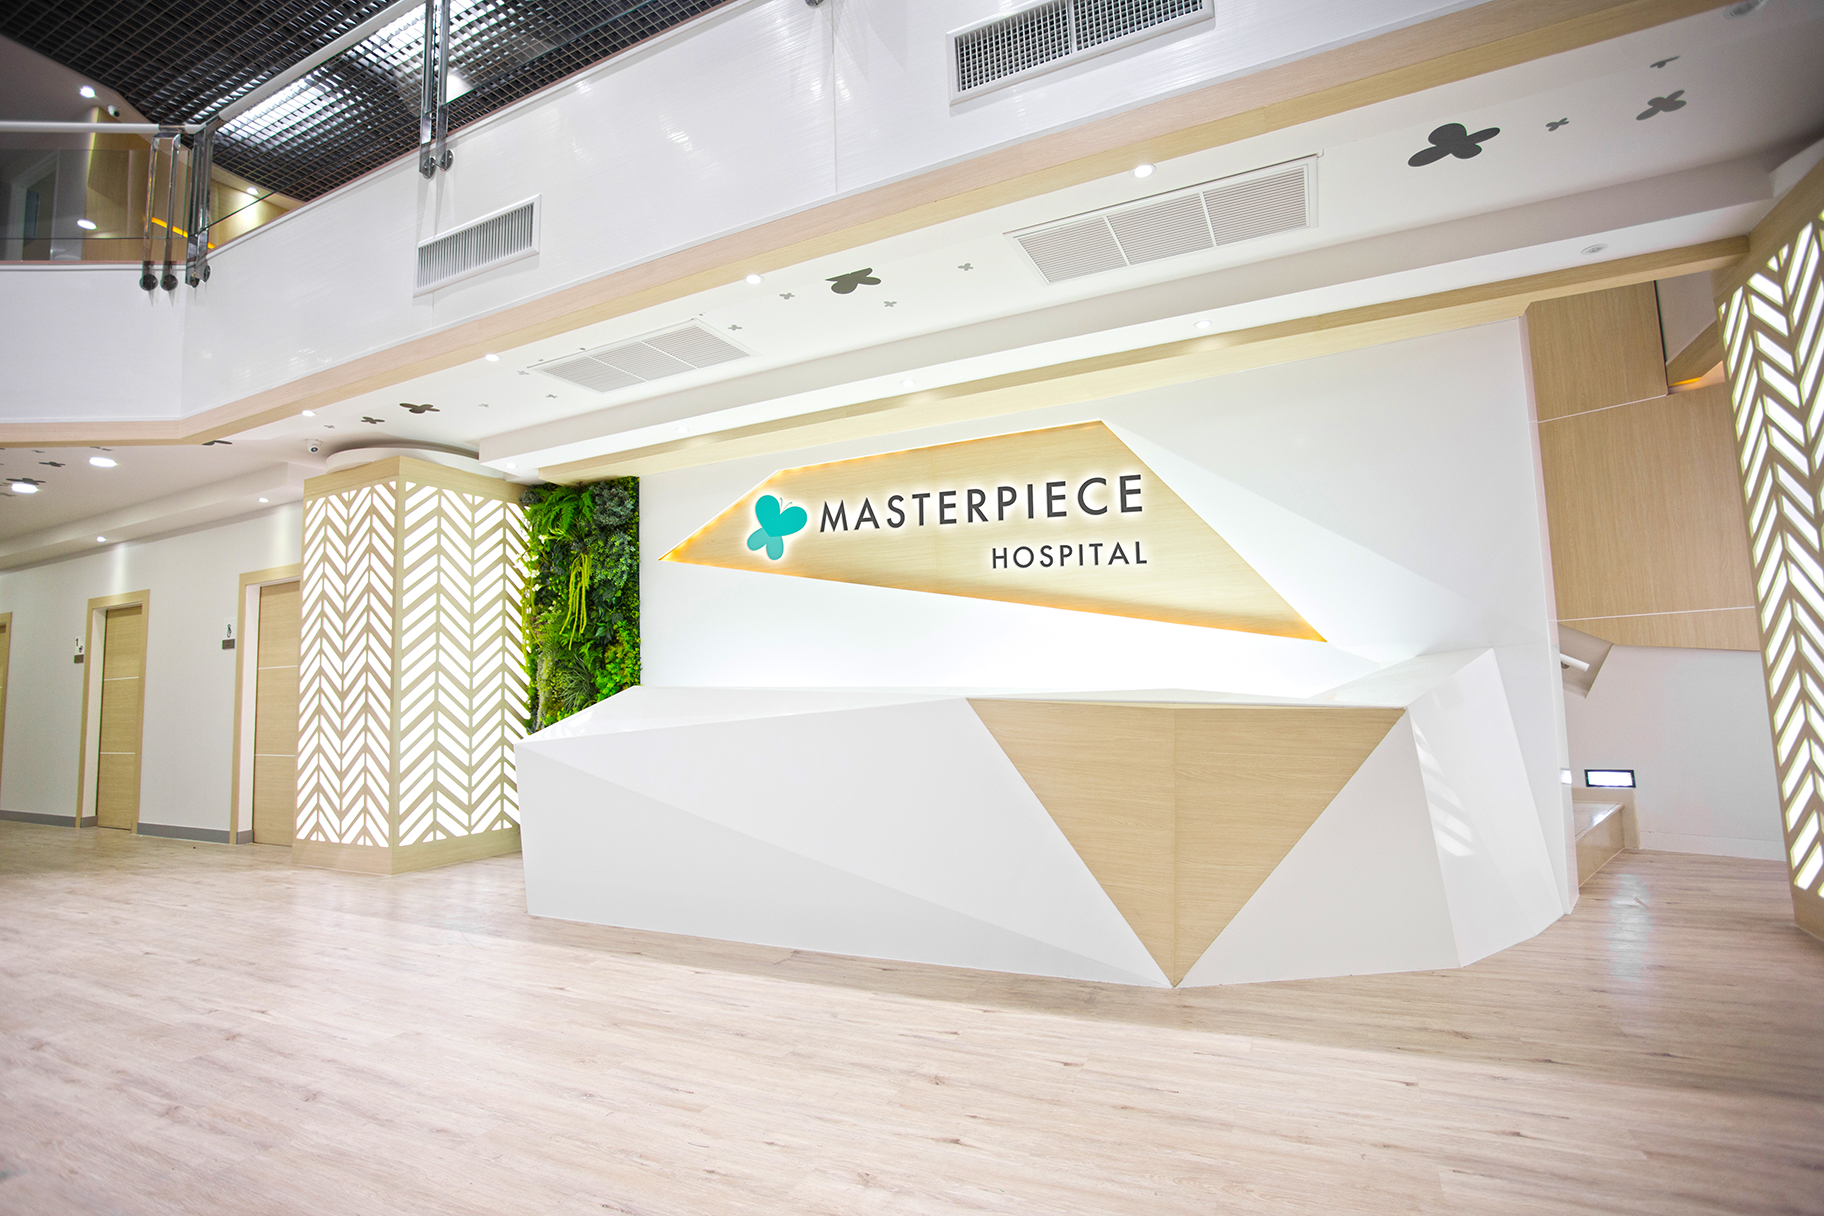 Masterpiece Hospital